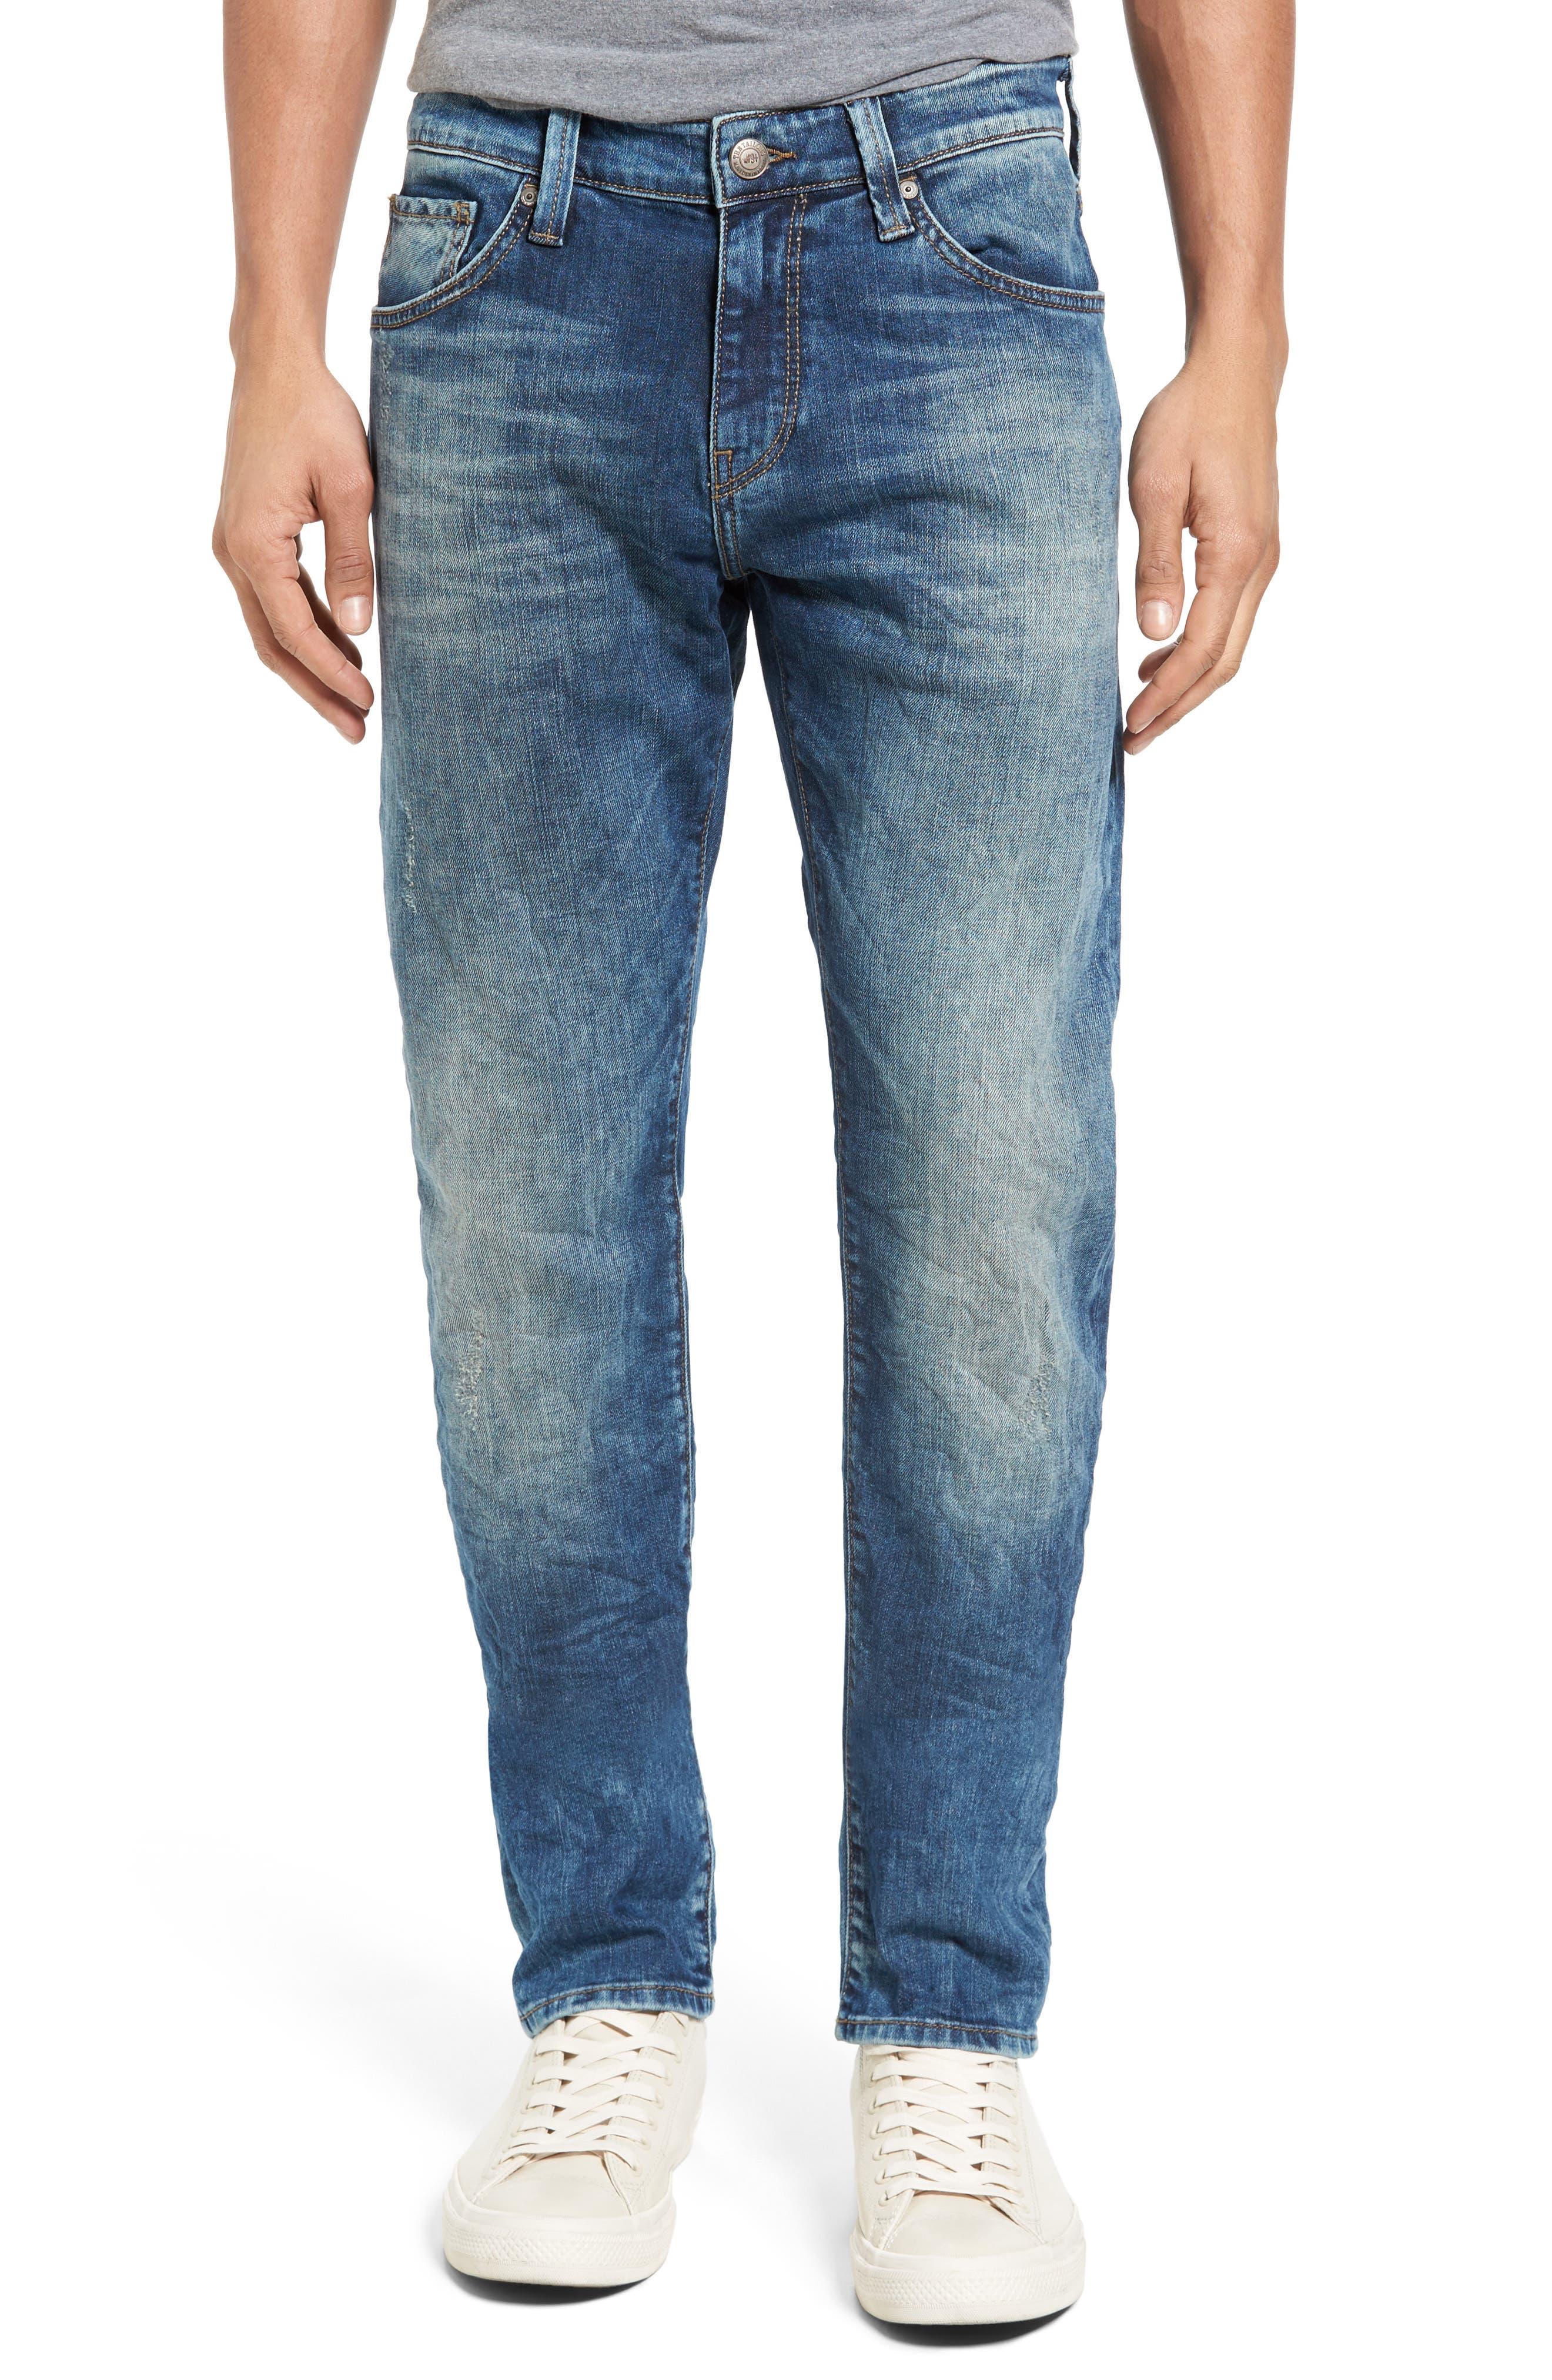 Jake Easy Slim Fit Jeans,                             Main thumbnail 1, color,                             420